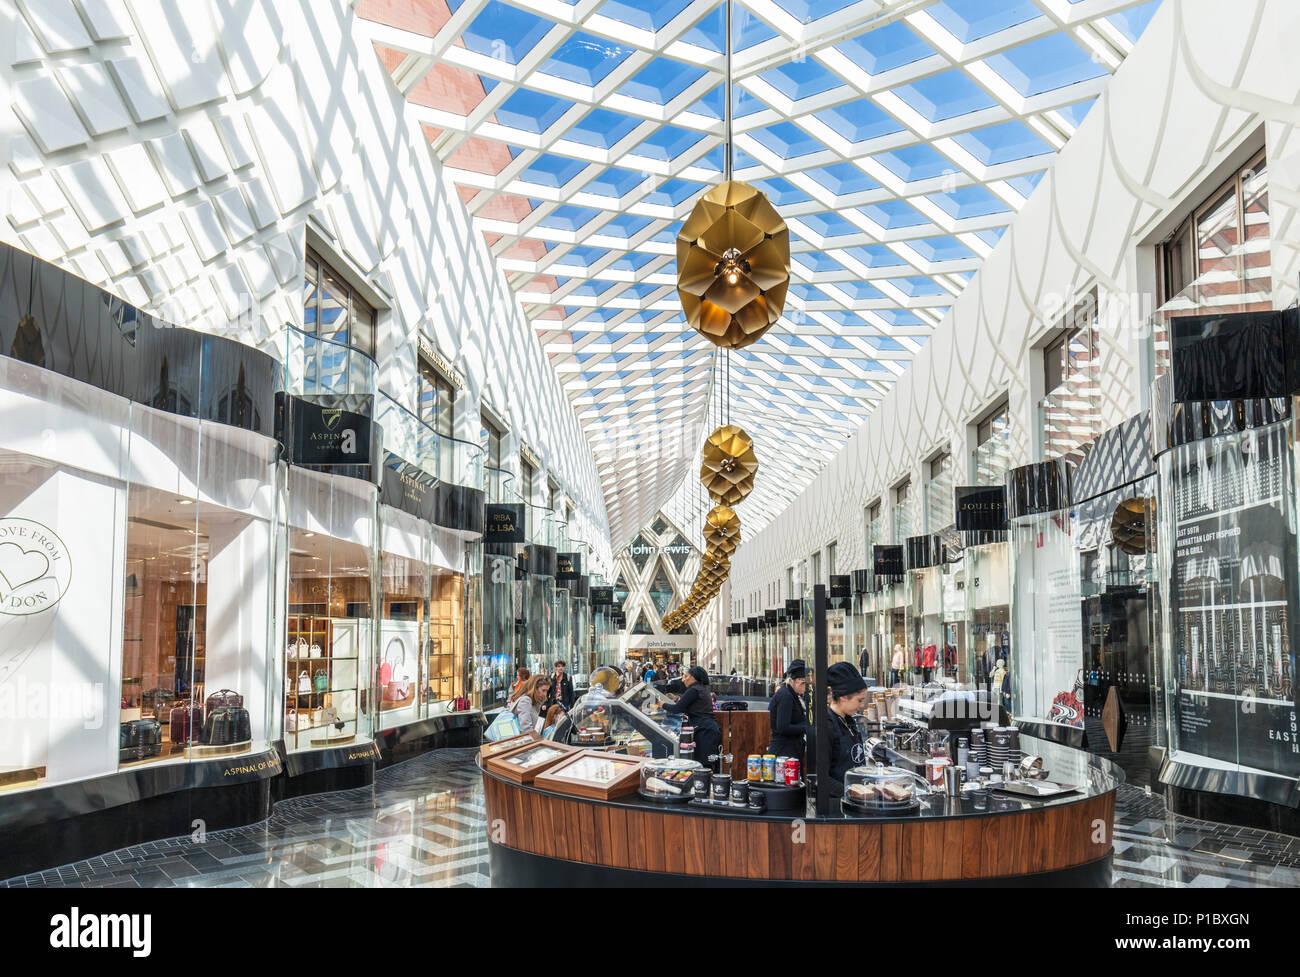 2de5870c6f Yorkshire England Leeds Leeds yorkshire Victoria Shopping Center  viktorianischen Arkaden Fashion Designer Shops High-End-Department Store  Leeds England ...